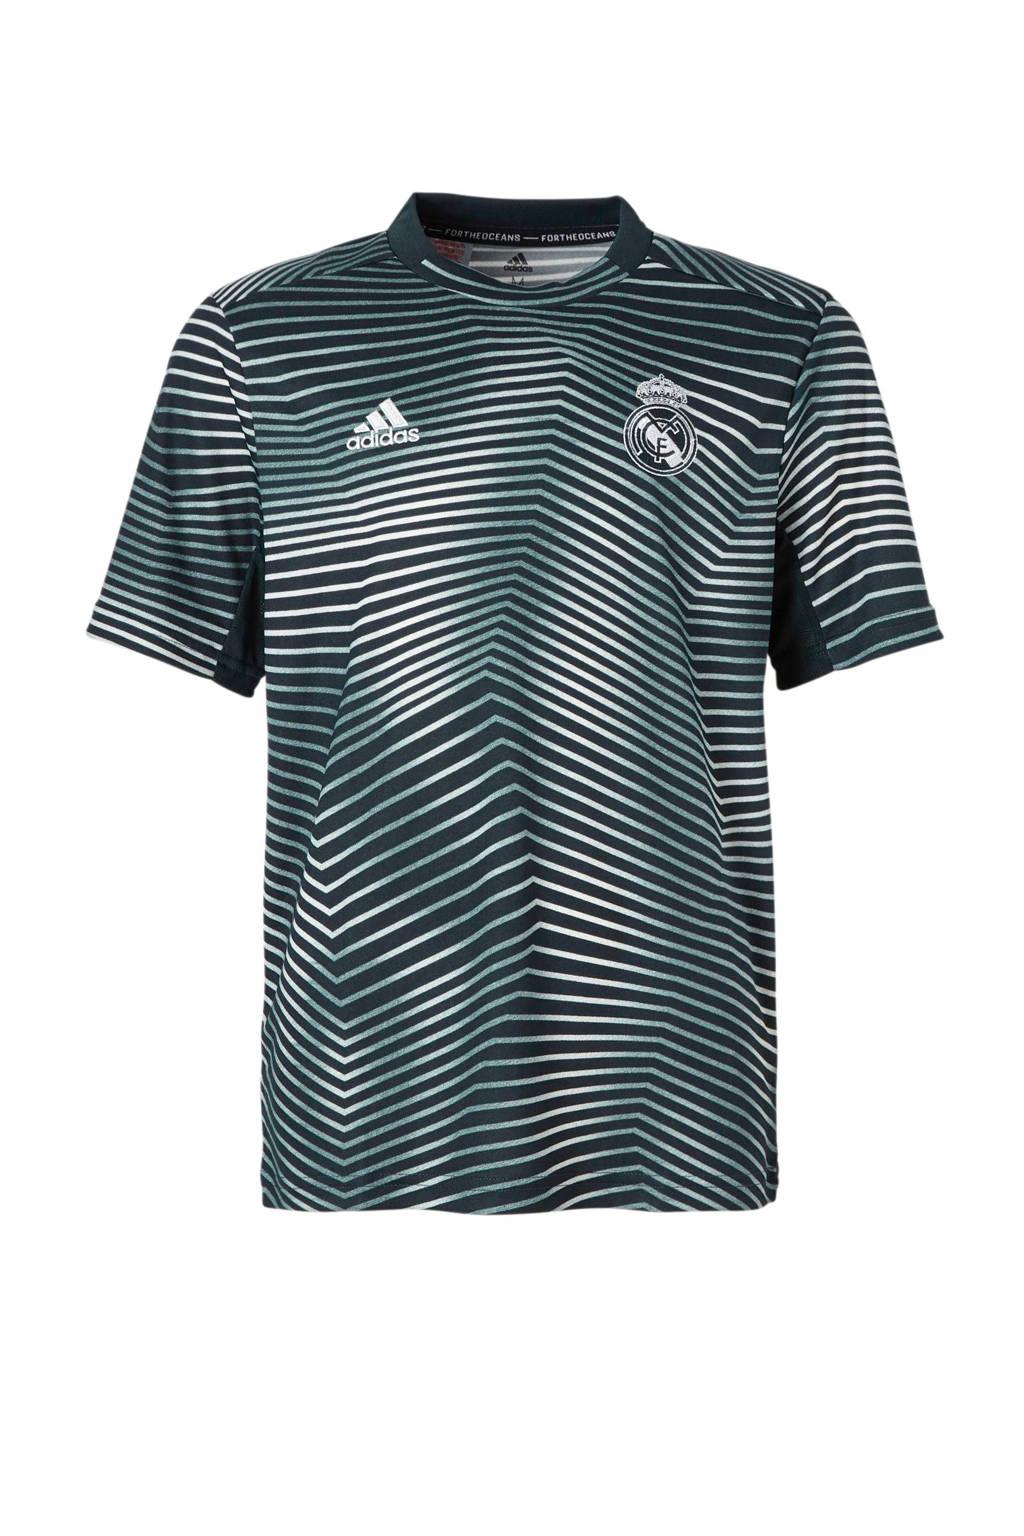 adidas performance Junior Real Madrid voetbalshirt, Antraciet/grijs